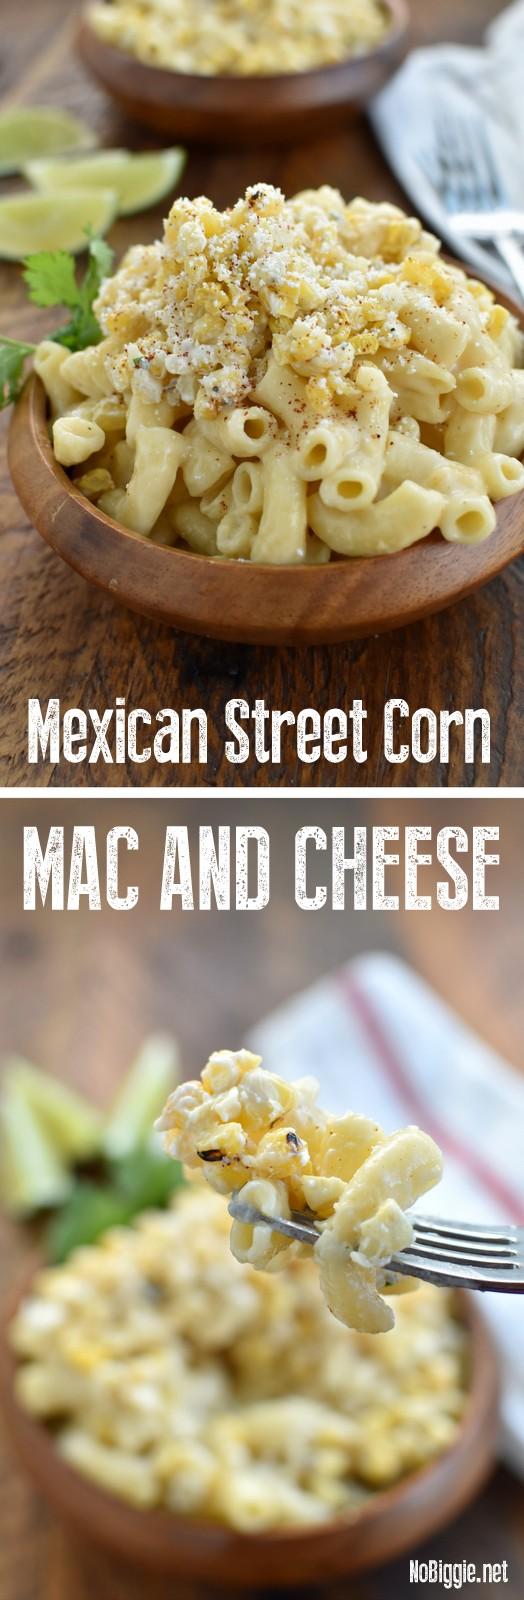 Mexican Street Corn Mac and Cheese | NoBiggie.net